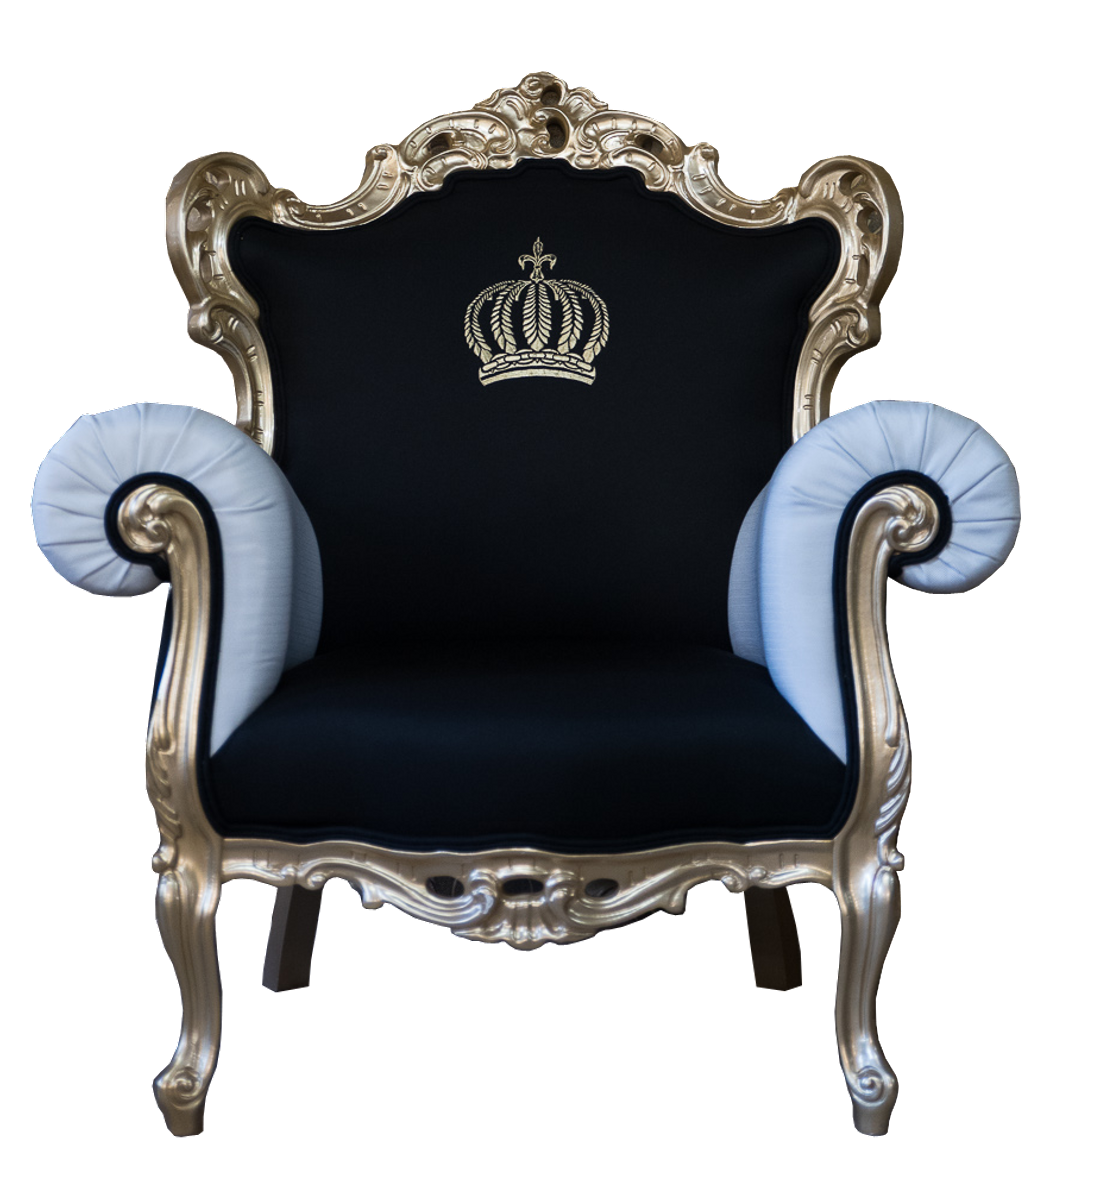 Pompöös By Casa Padrino Luxus Barock Sessel Schwarz Weiß Gold